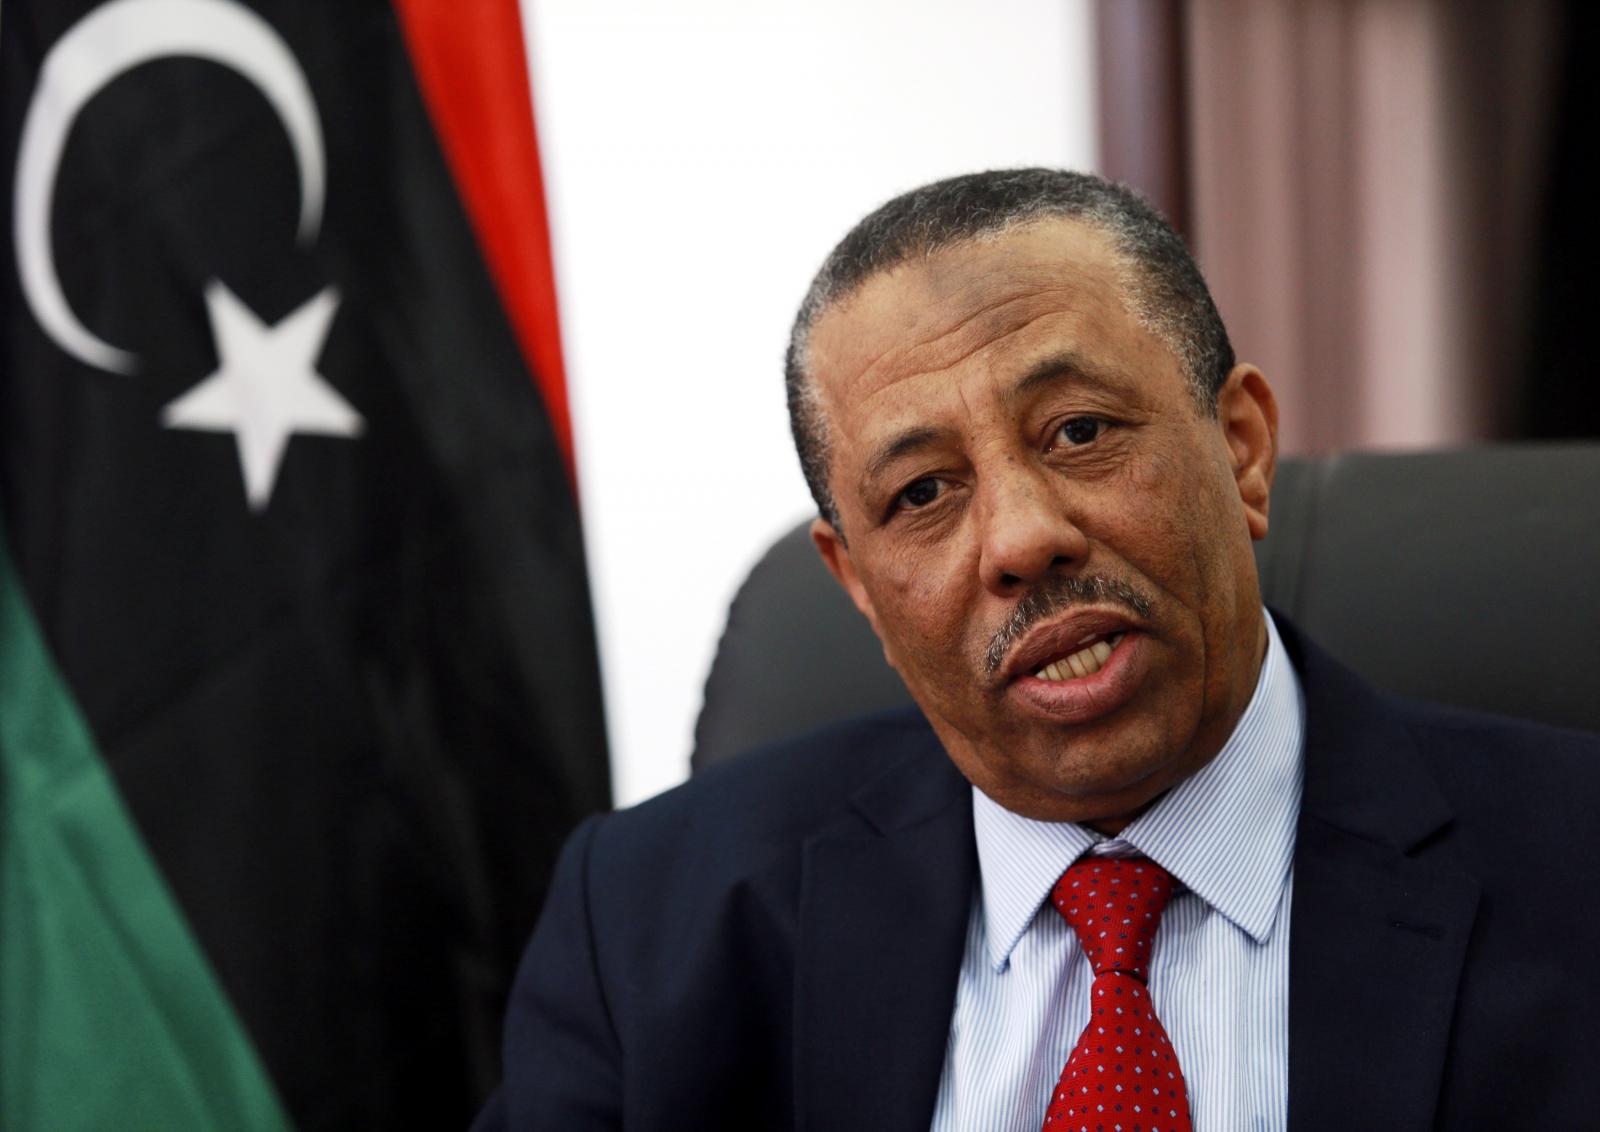 Prime Minister Abdullah al-Thinni